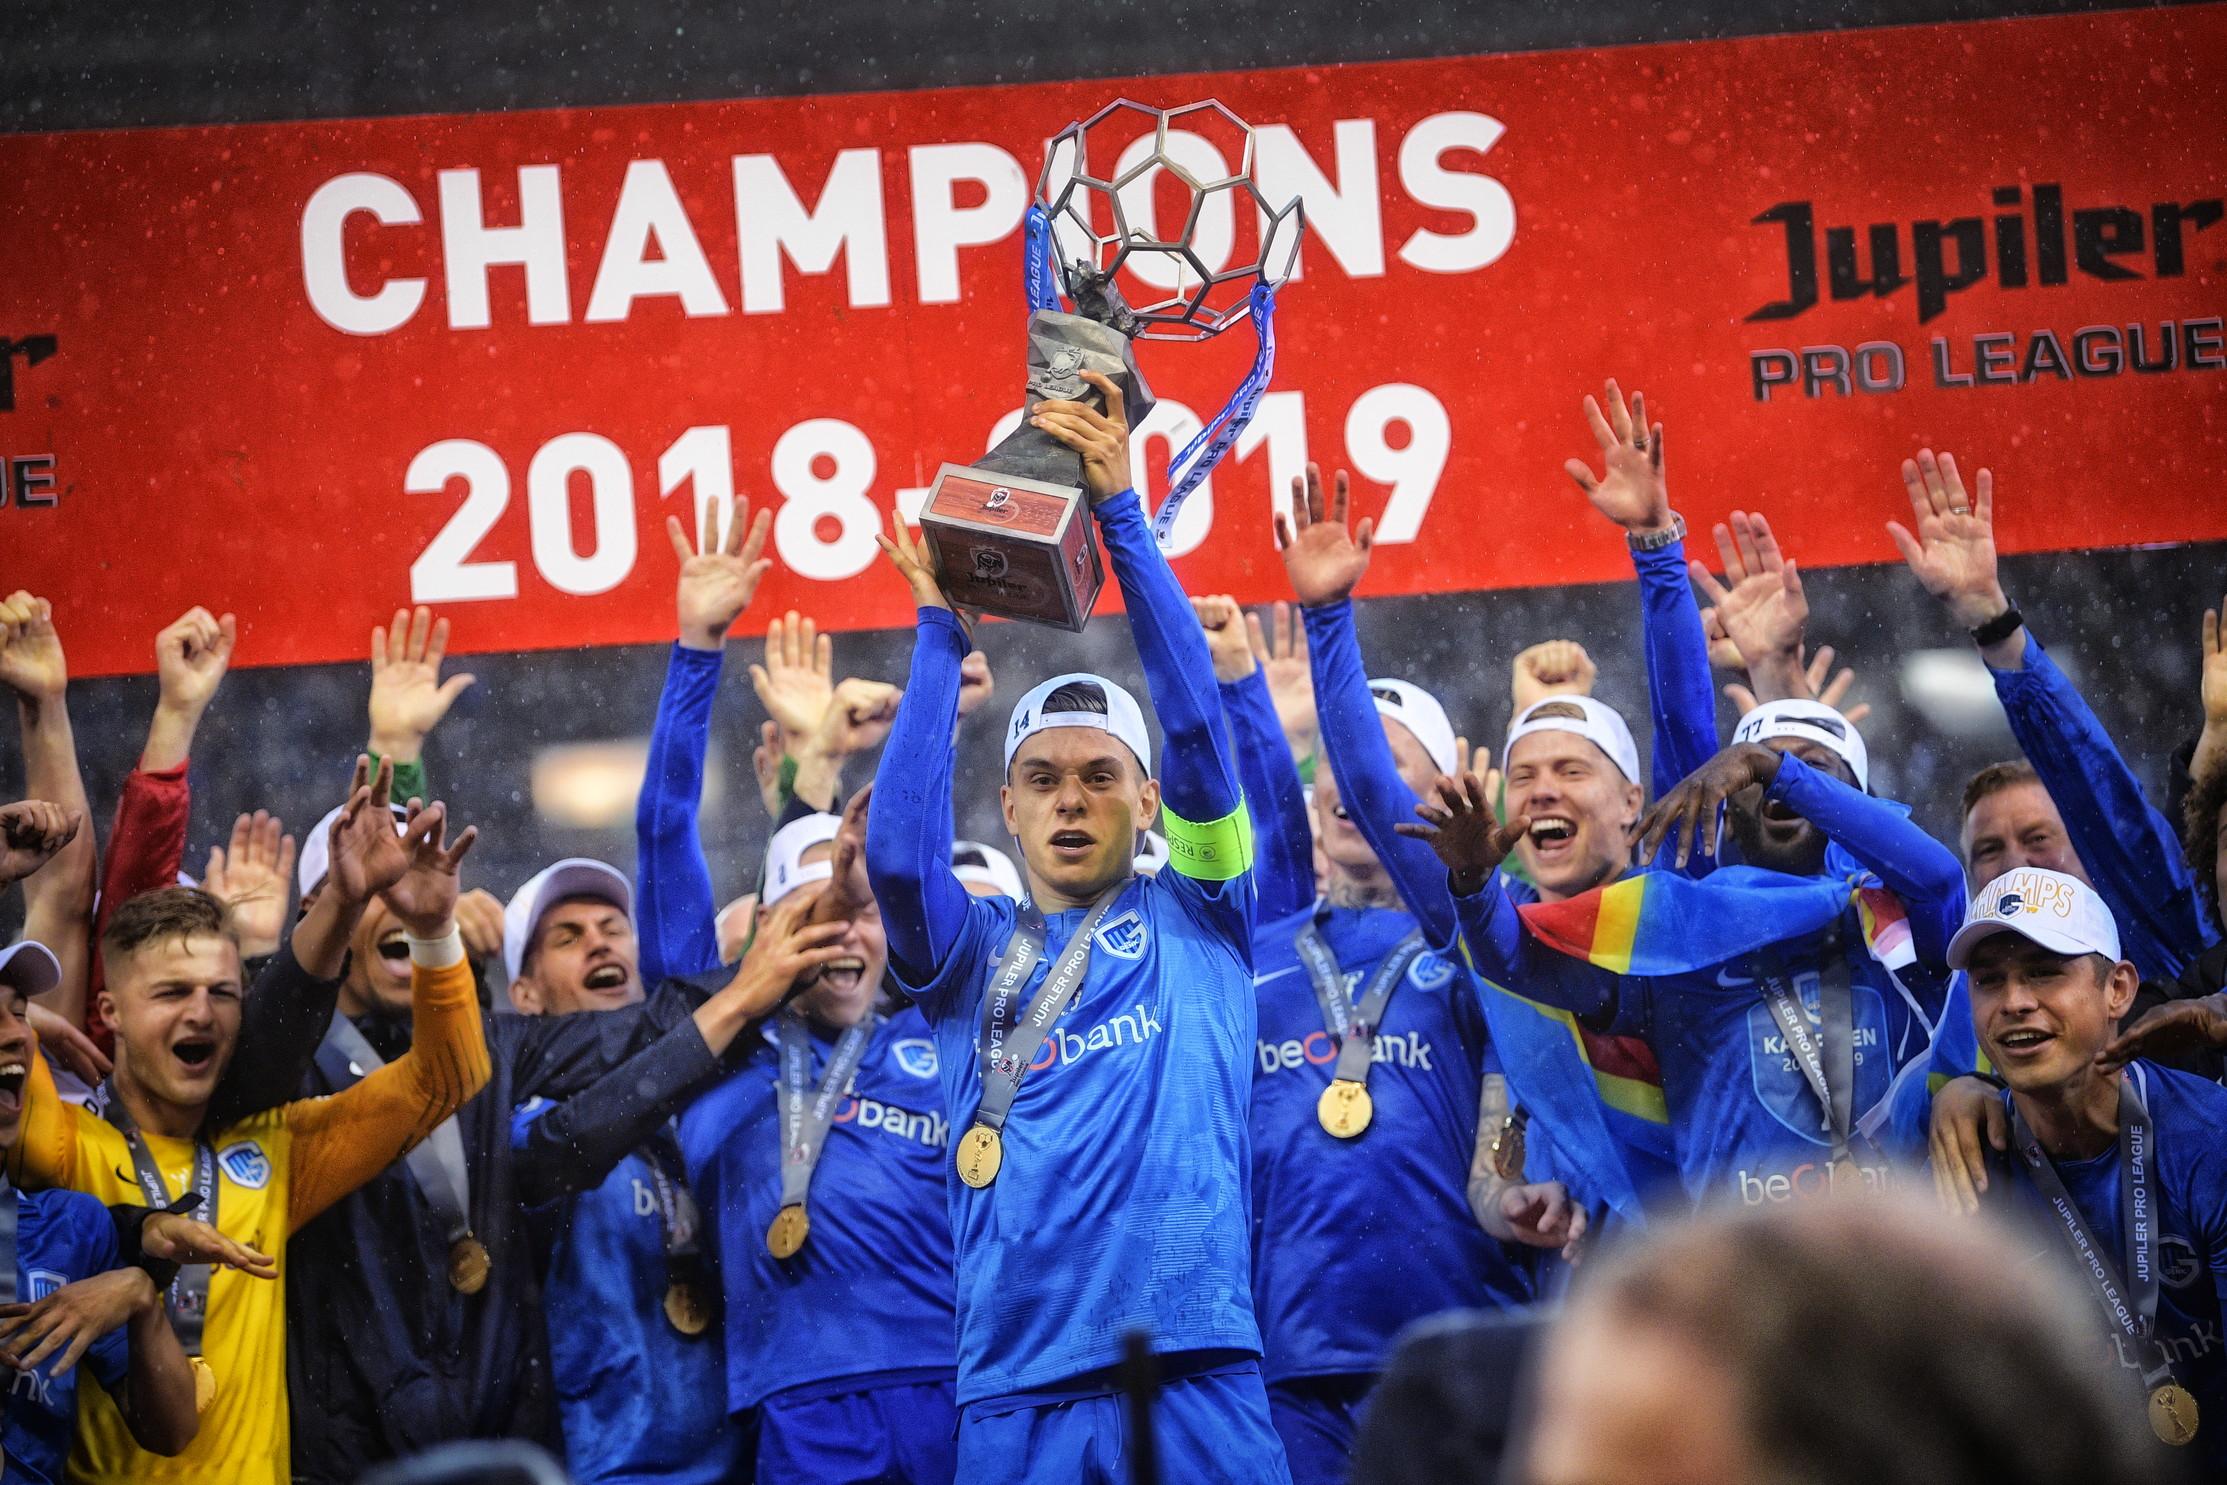 Pro League Belgio: Genk